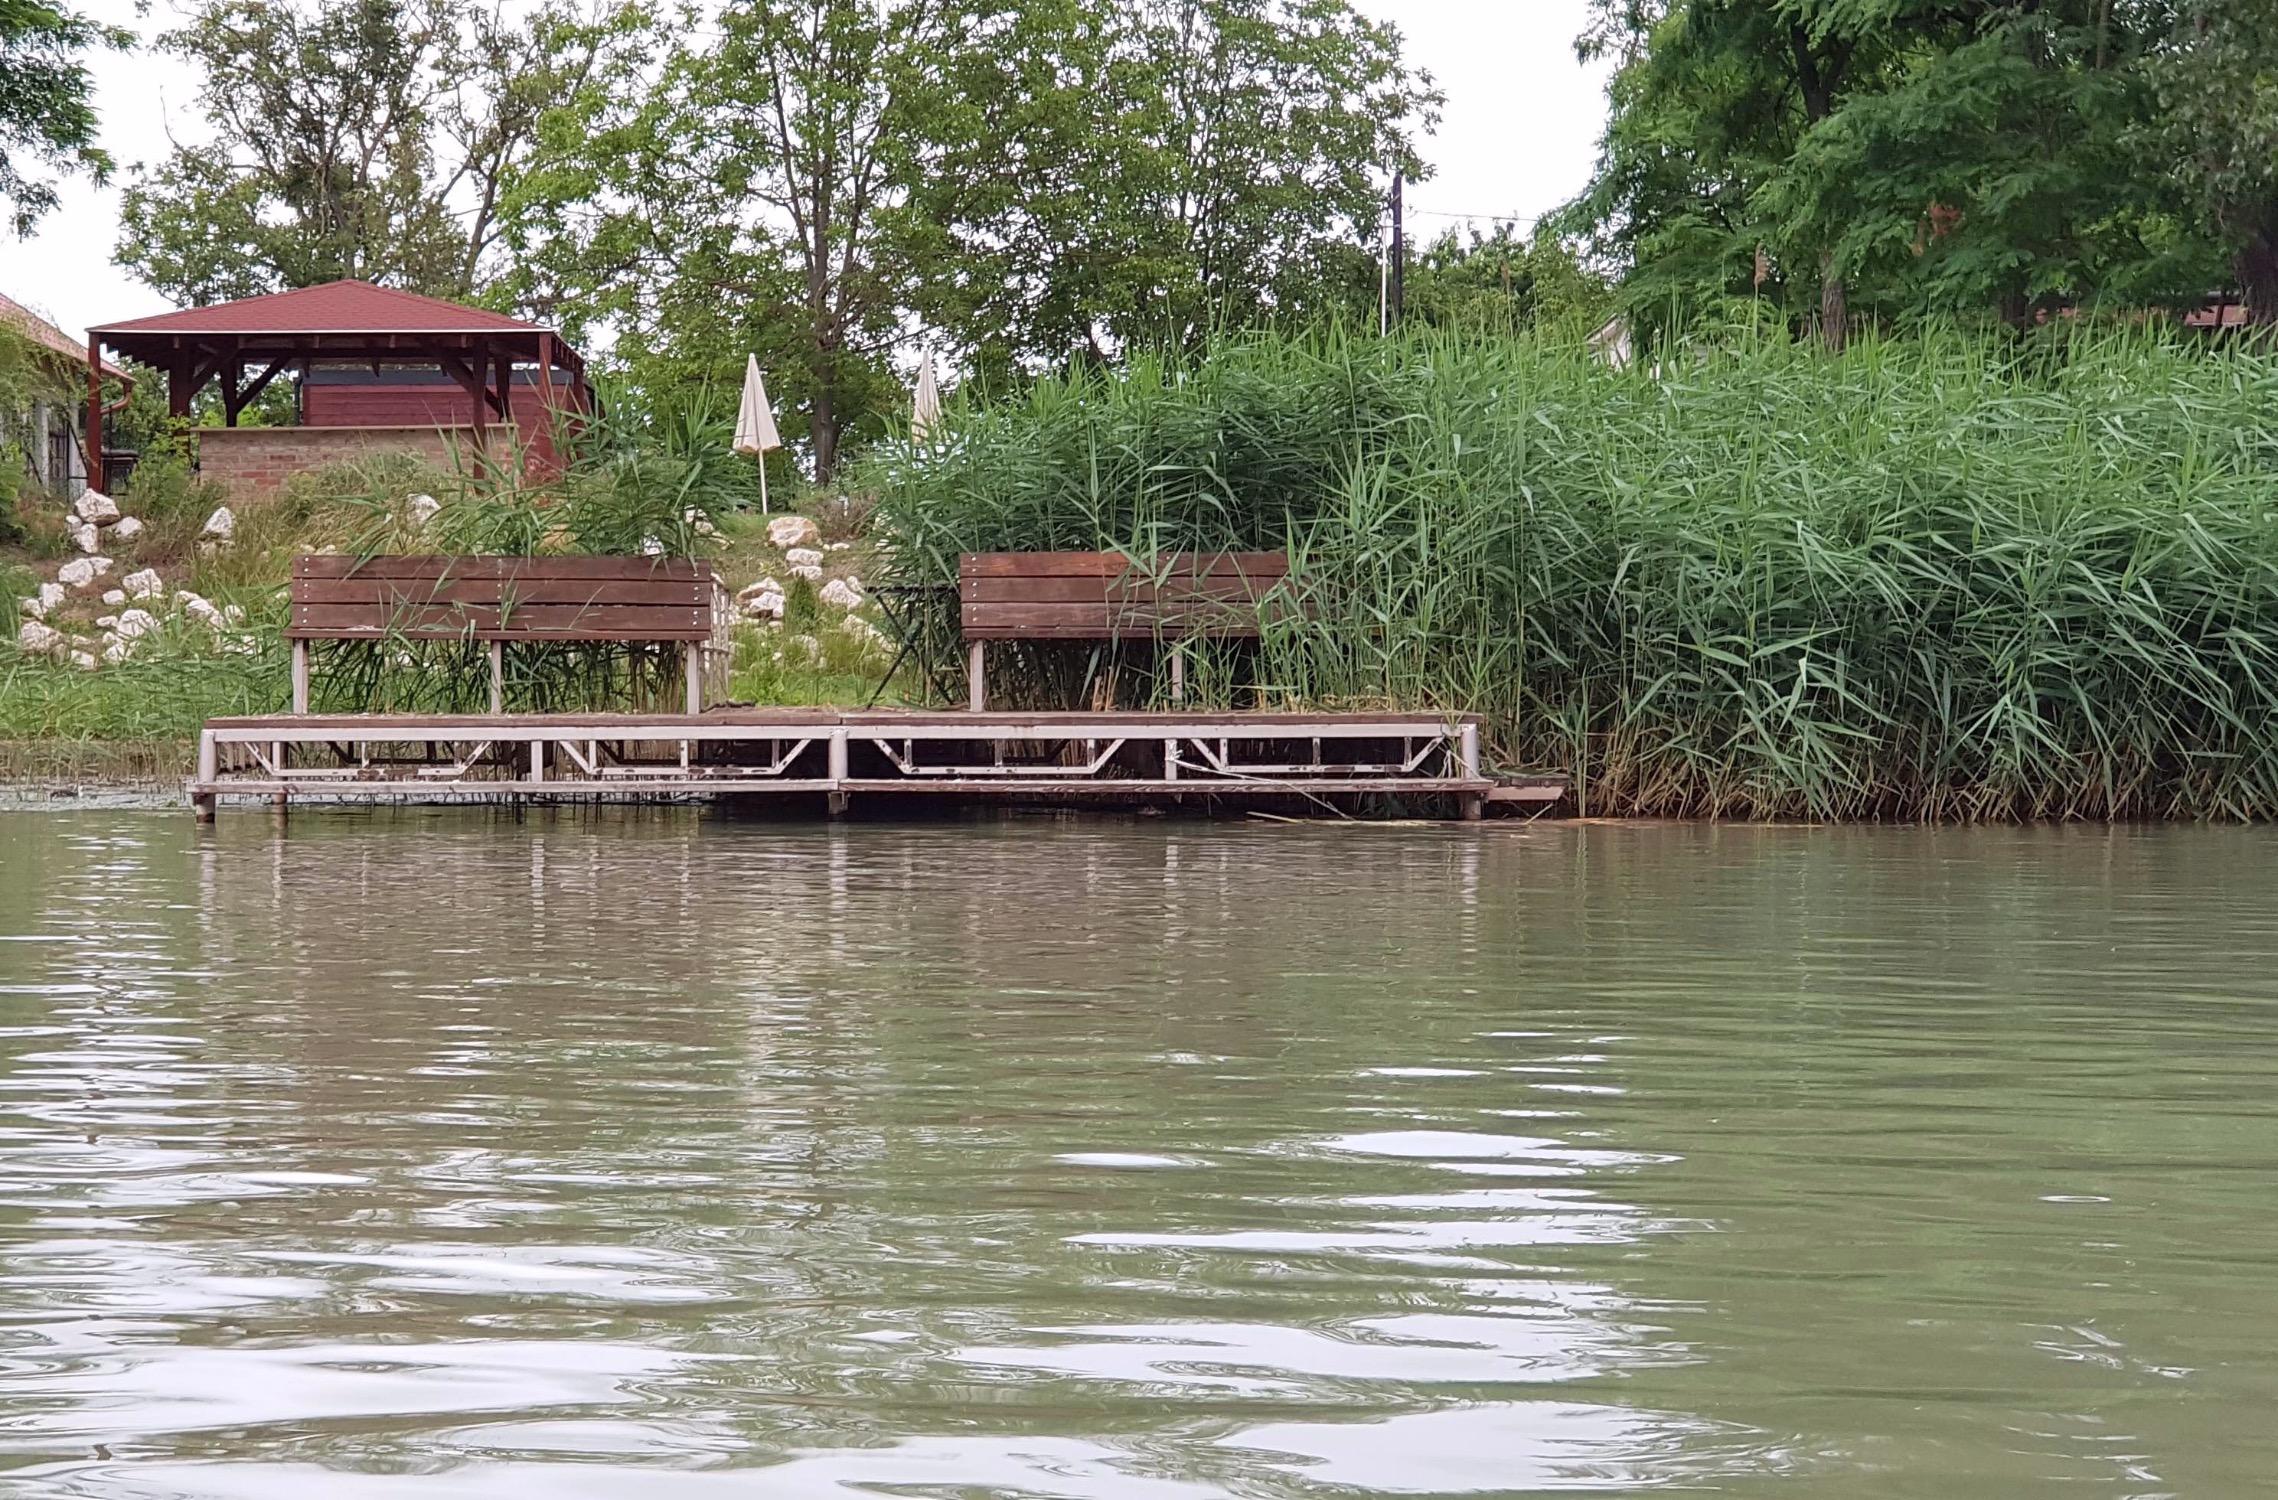 Vendégház stég, vízparti fogadó